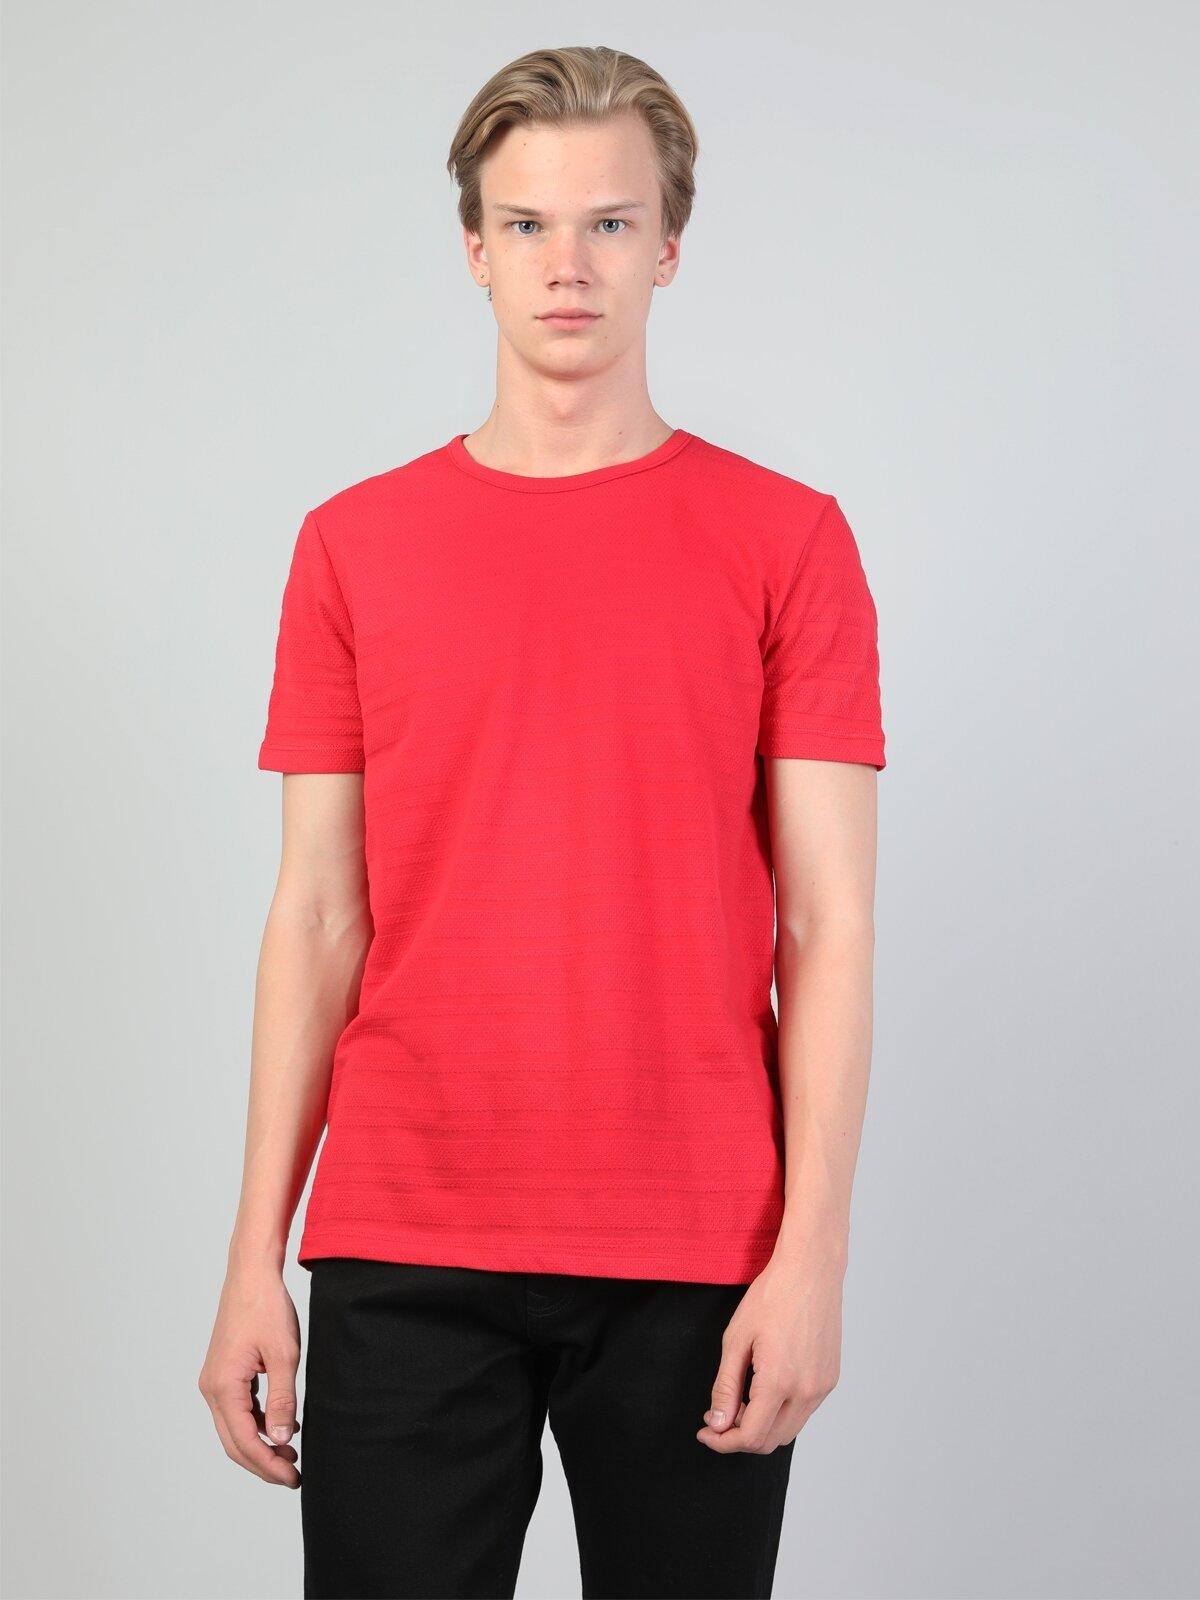 Regular Fit Bisiklet Yaka Erkek Kırmızı Kısa Kol Tişört